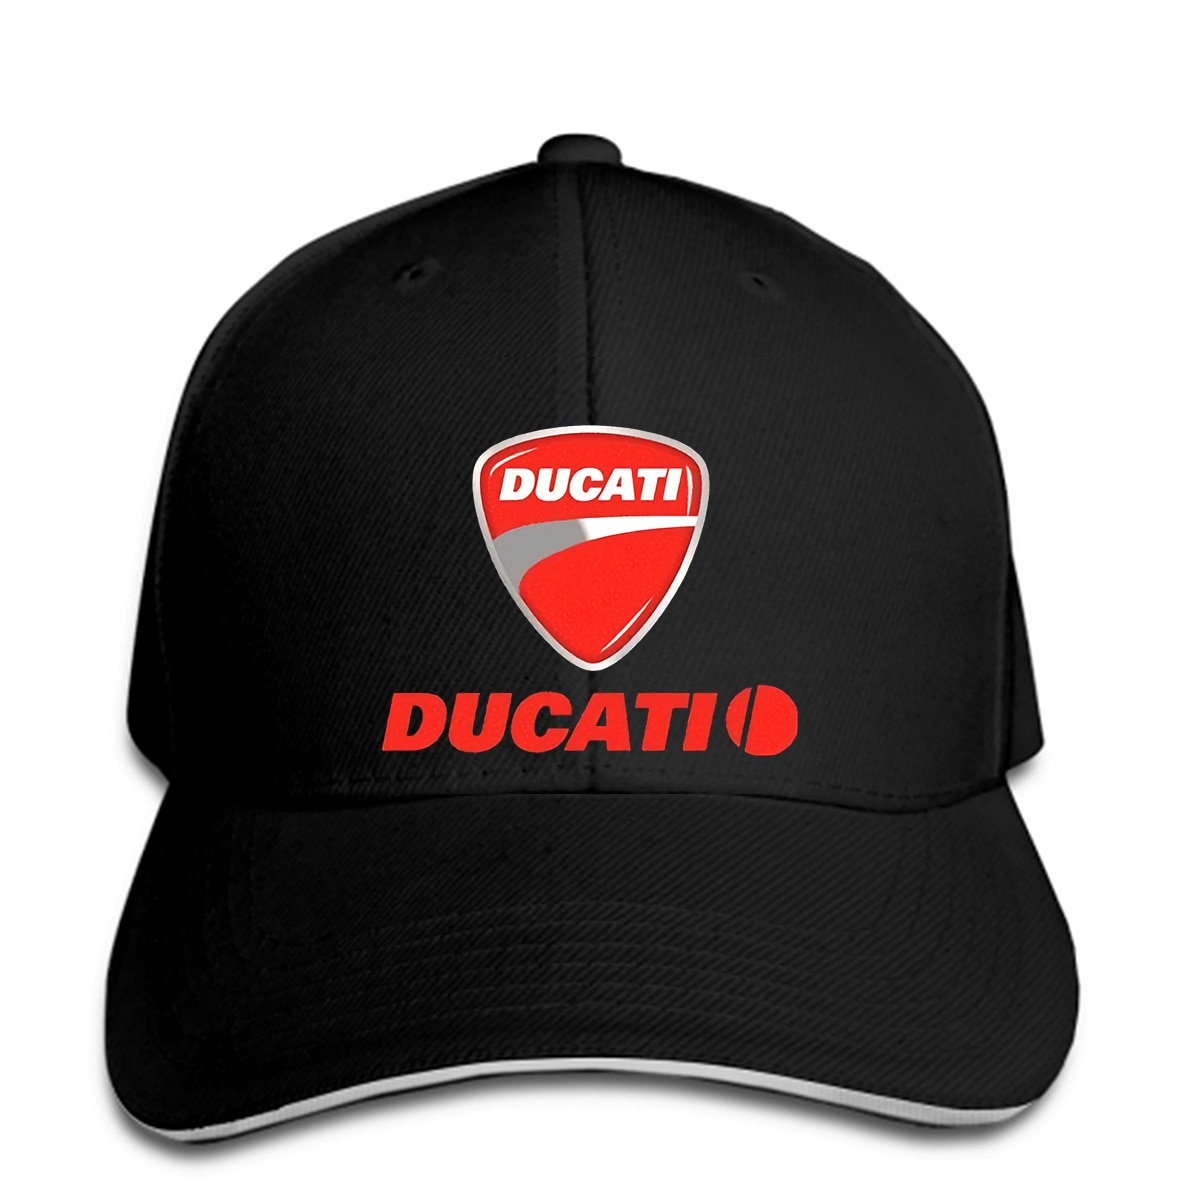 Baseball-Cap-della-Ducati-racing-snapback-hat-Peaked